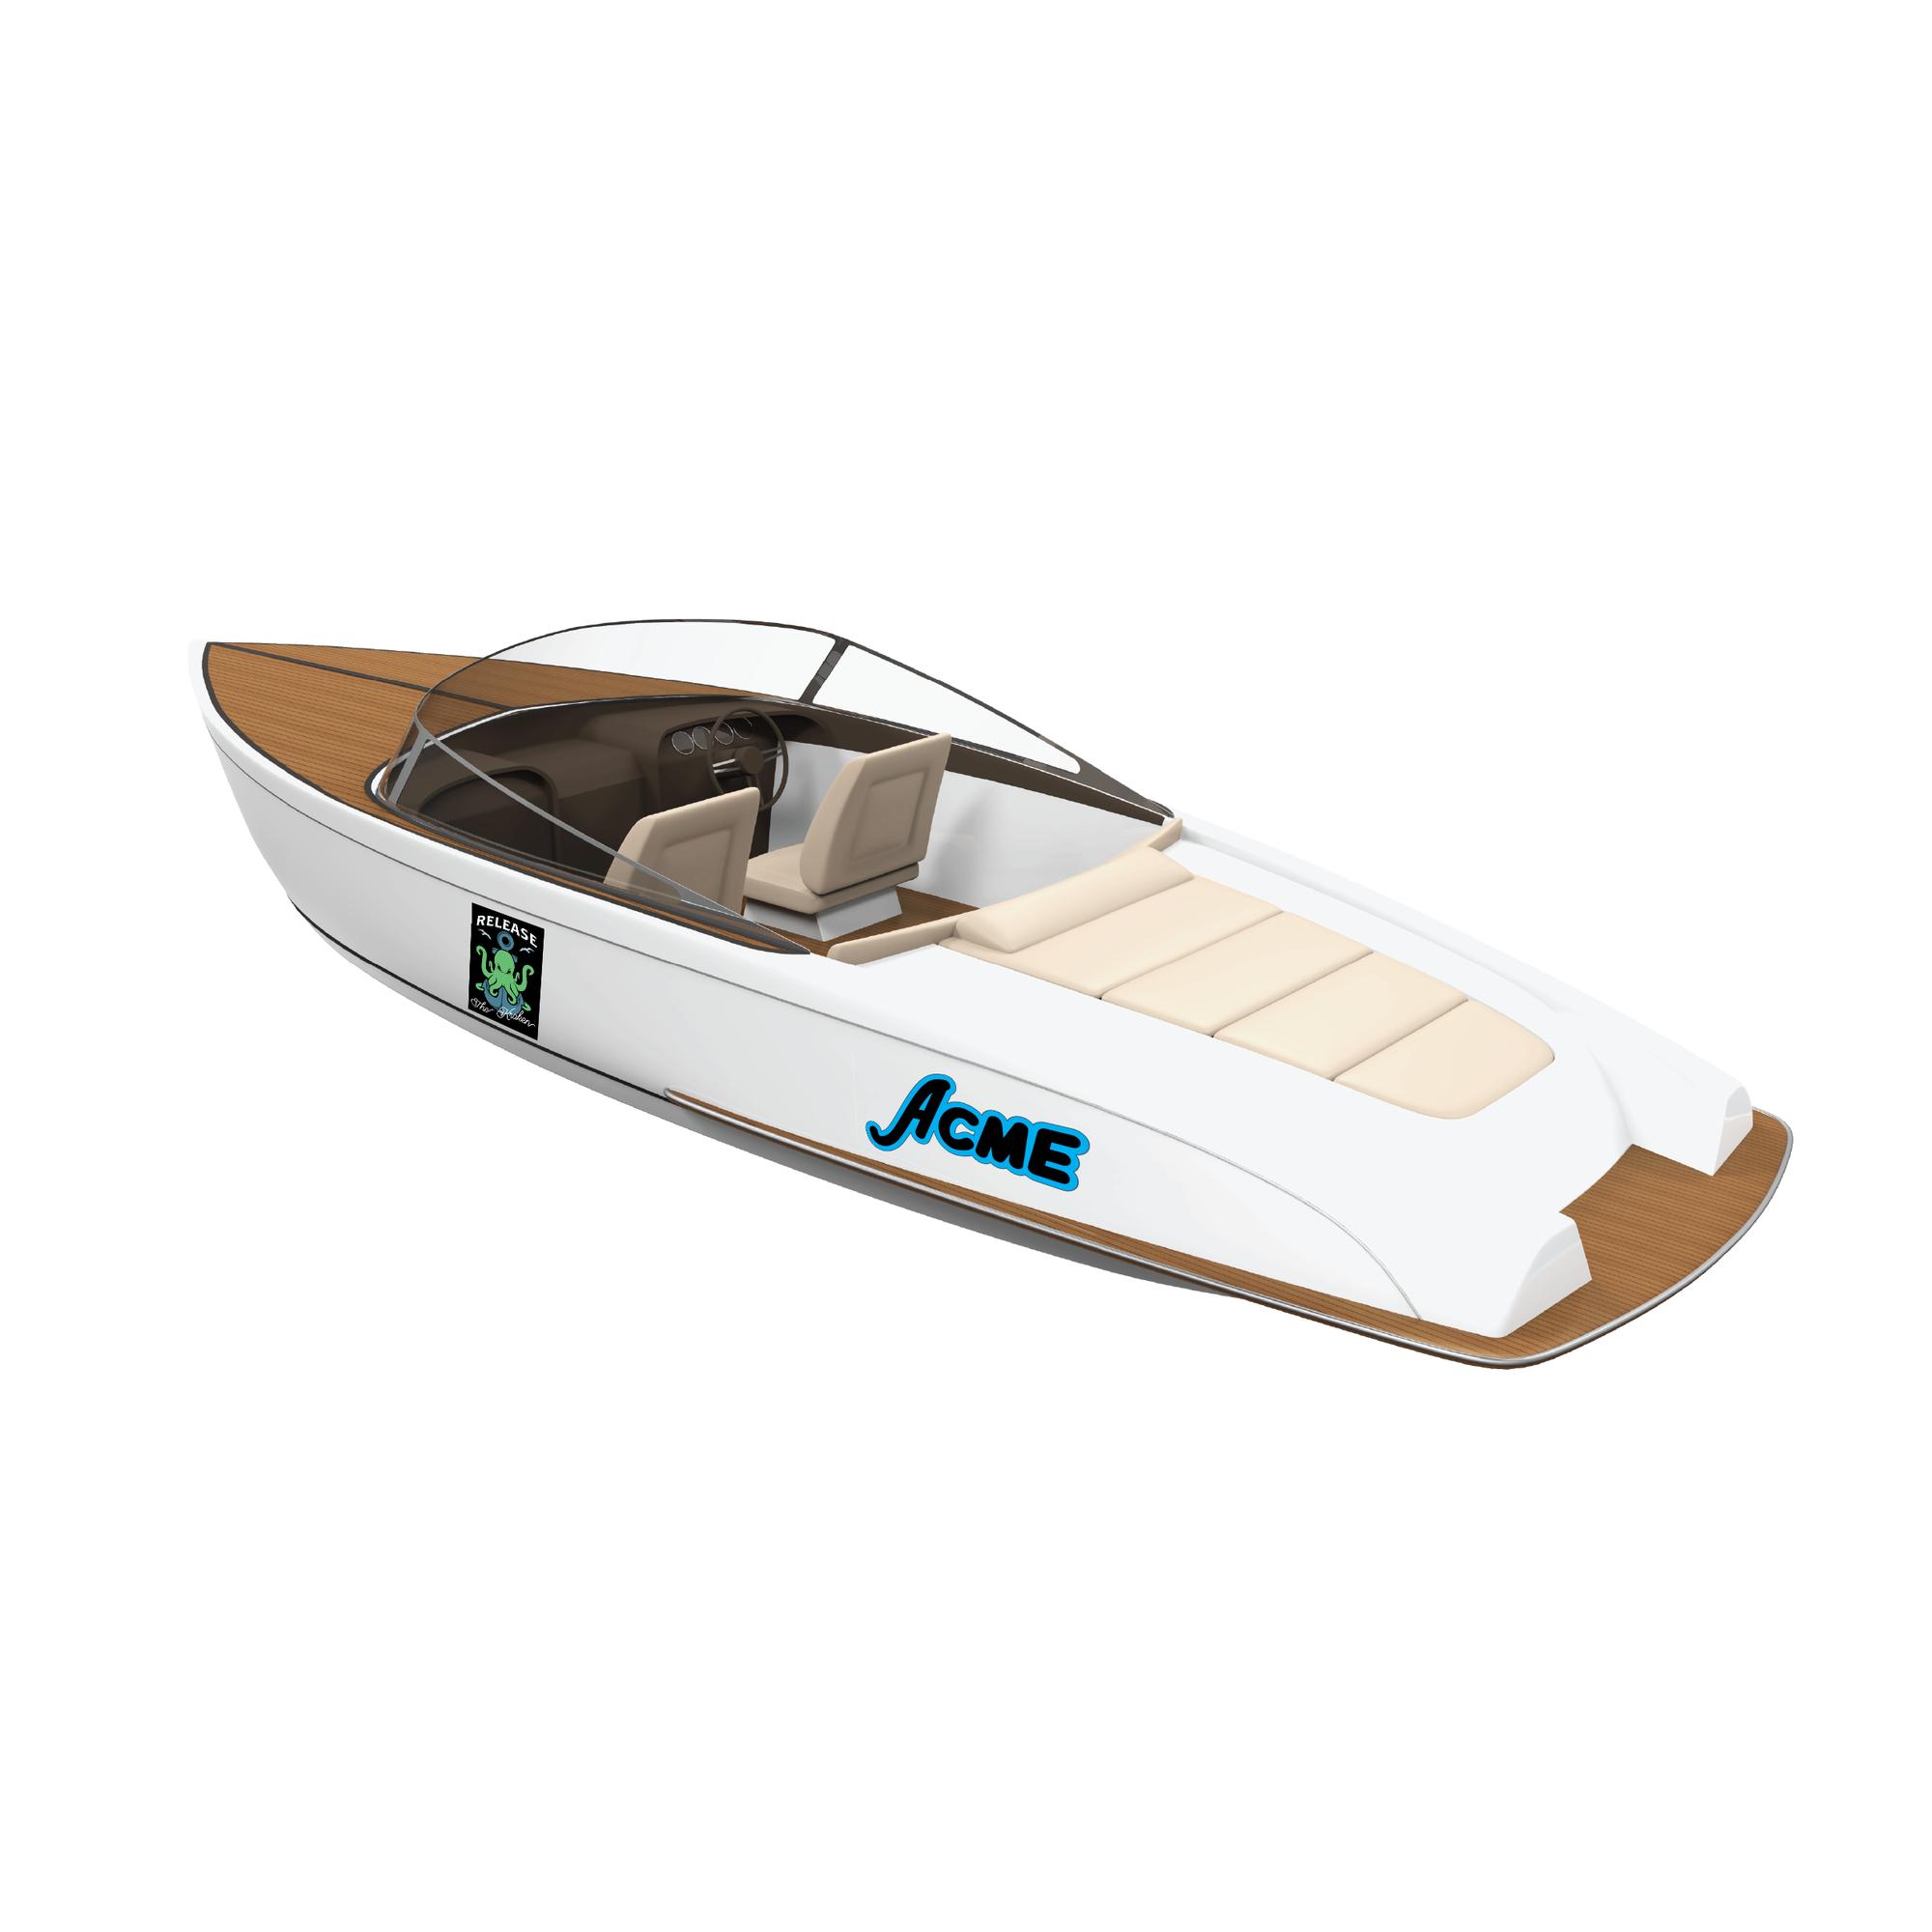 https://shop.allbizsupplies.biz/images/products_gallery_images/speedboat-0137.png